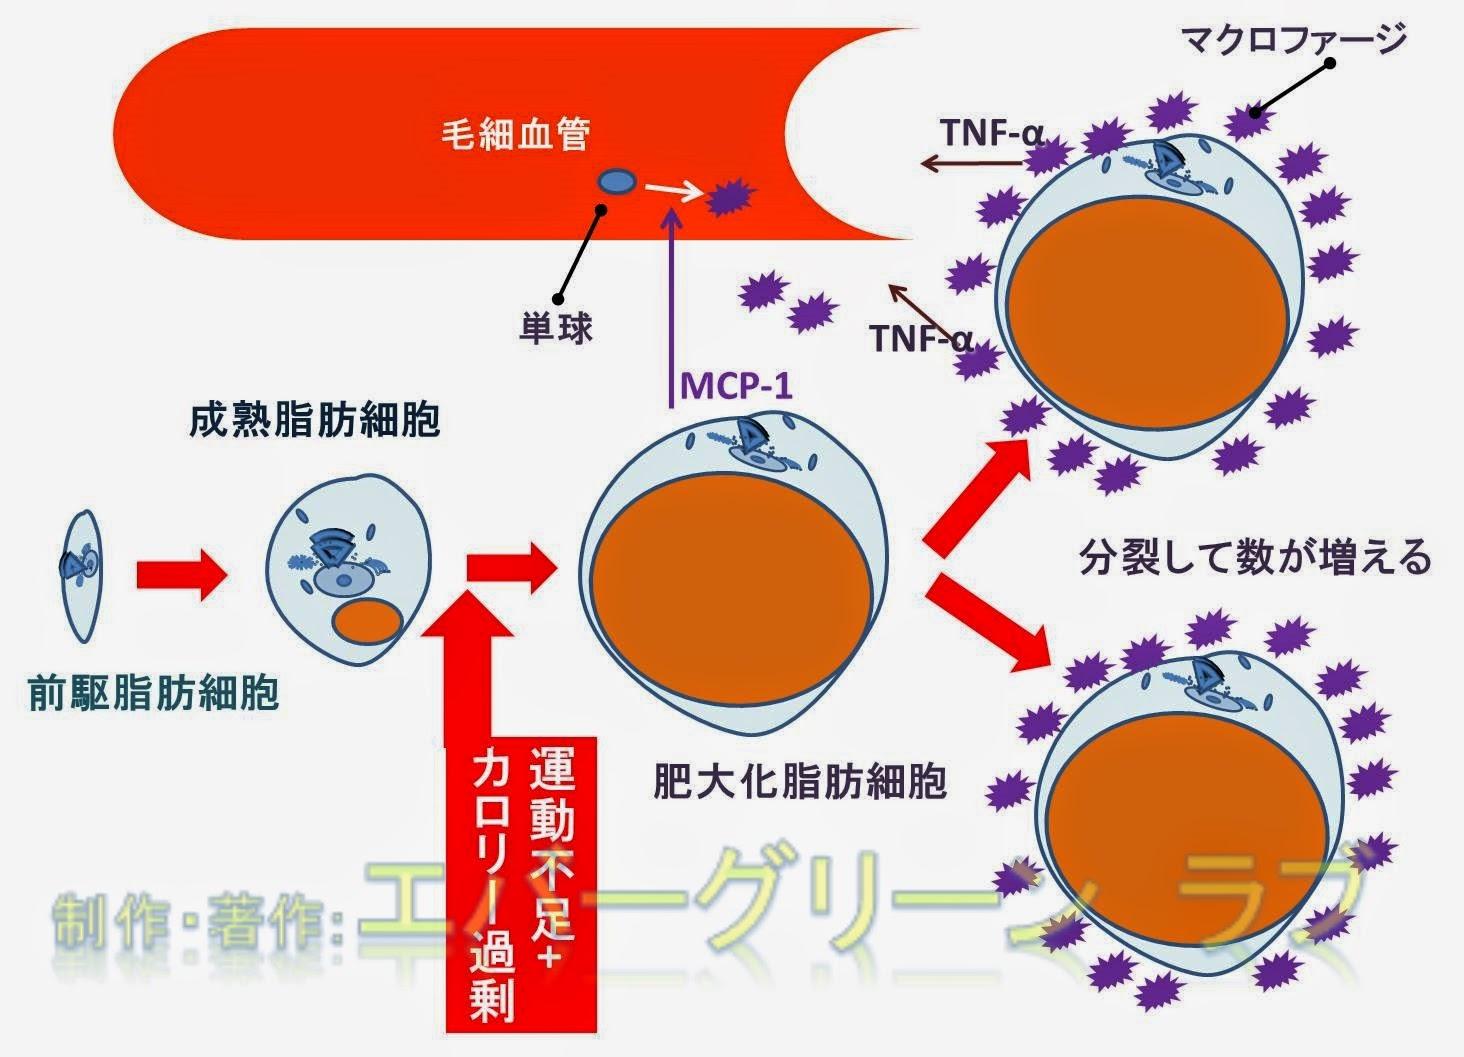 TNFα, アディポネクチン, インスリン抵抗性, 前駆脂肪細胞, 成熟脂肪細胞, 炎症, 白色脂肪細胞, 肥大化脂肪細胞, 脂肪組織, アンジオテンシノーゲン,MCP-1, PAI-1,炎症,内臓肥満,